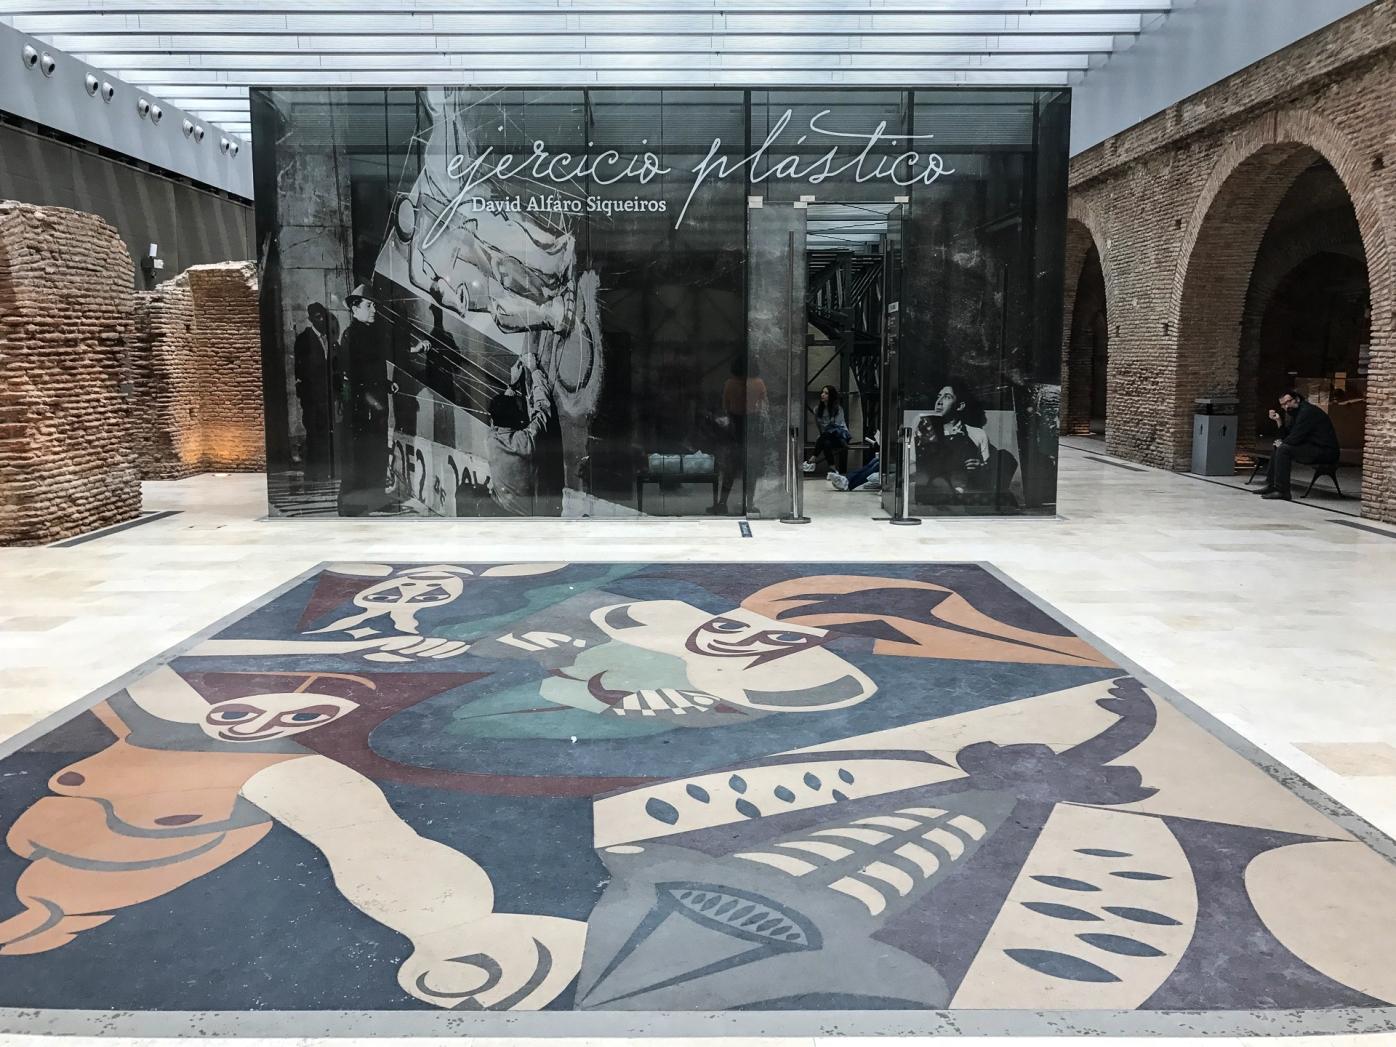 Ejercicio pl stico un mural de siqueiros oculto en for El mural de siqueiros en argentina